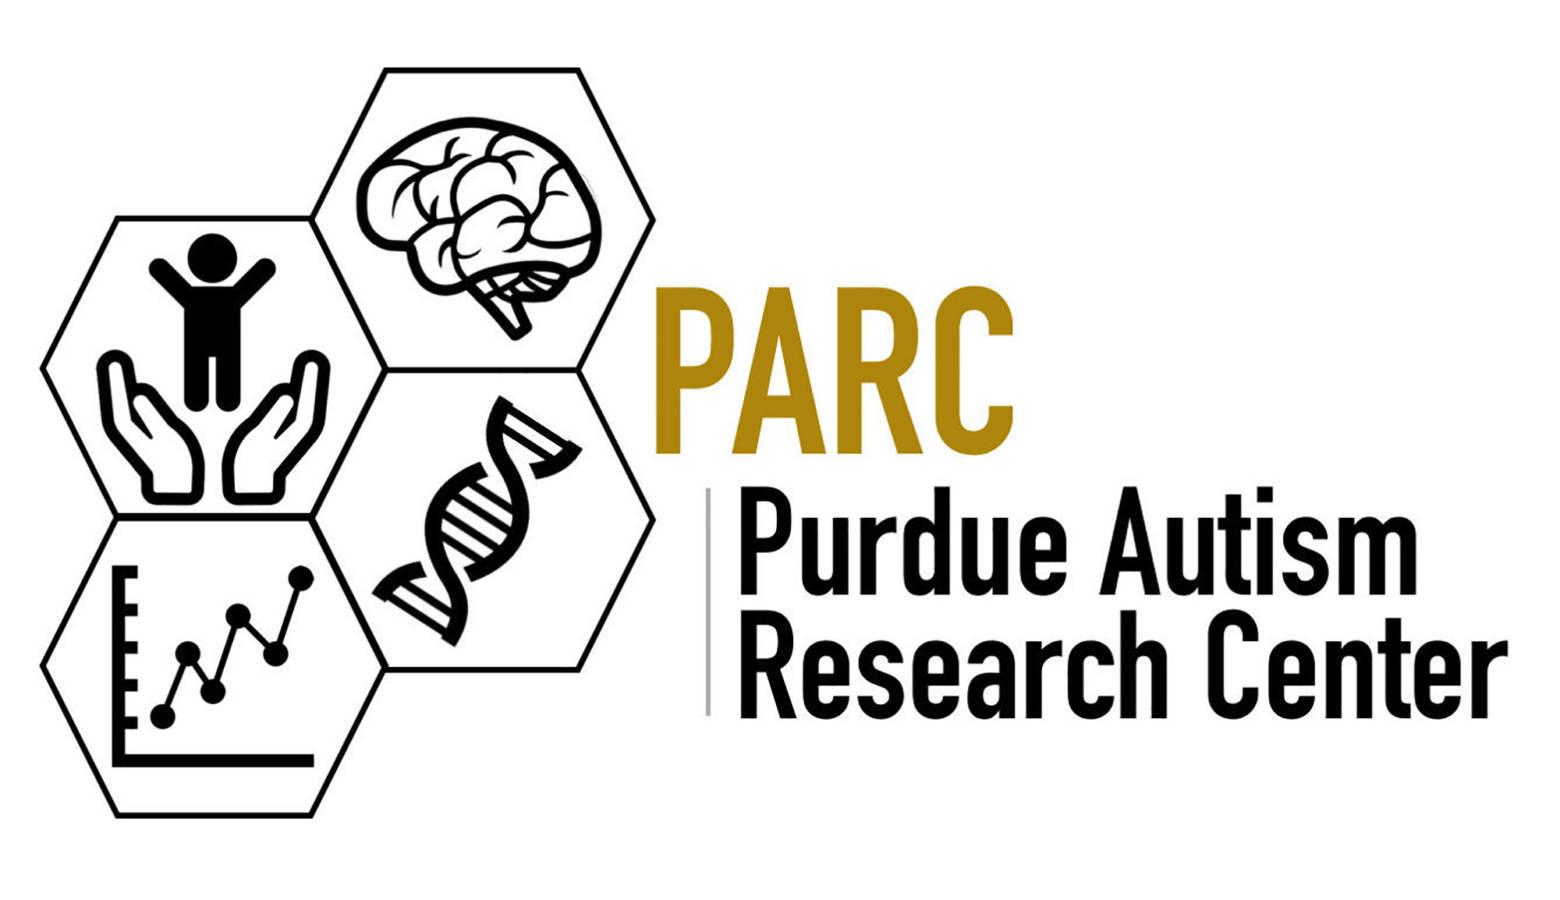 (Courtesy of Purdue University)